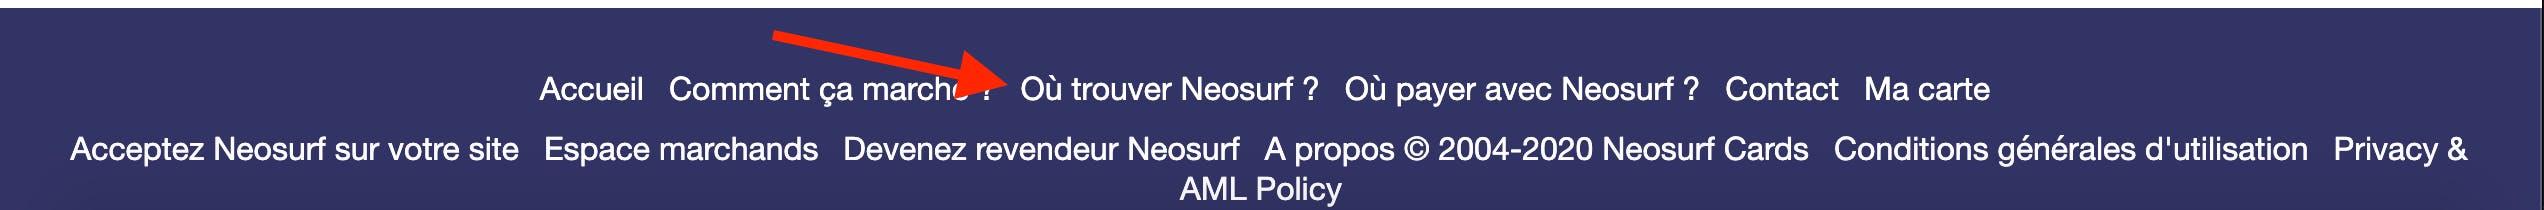 footer neosurf